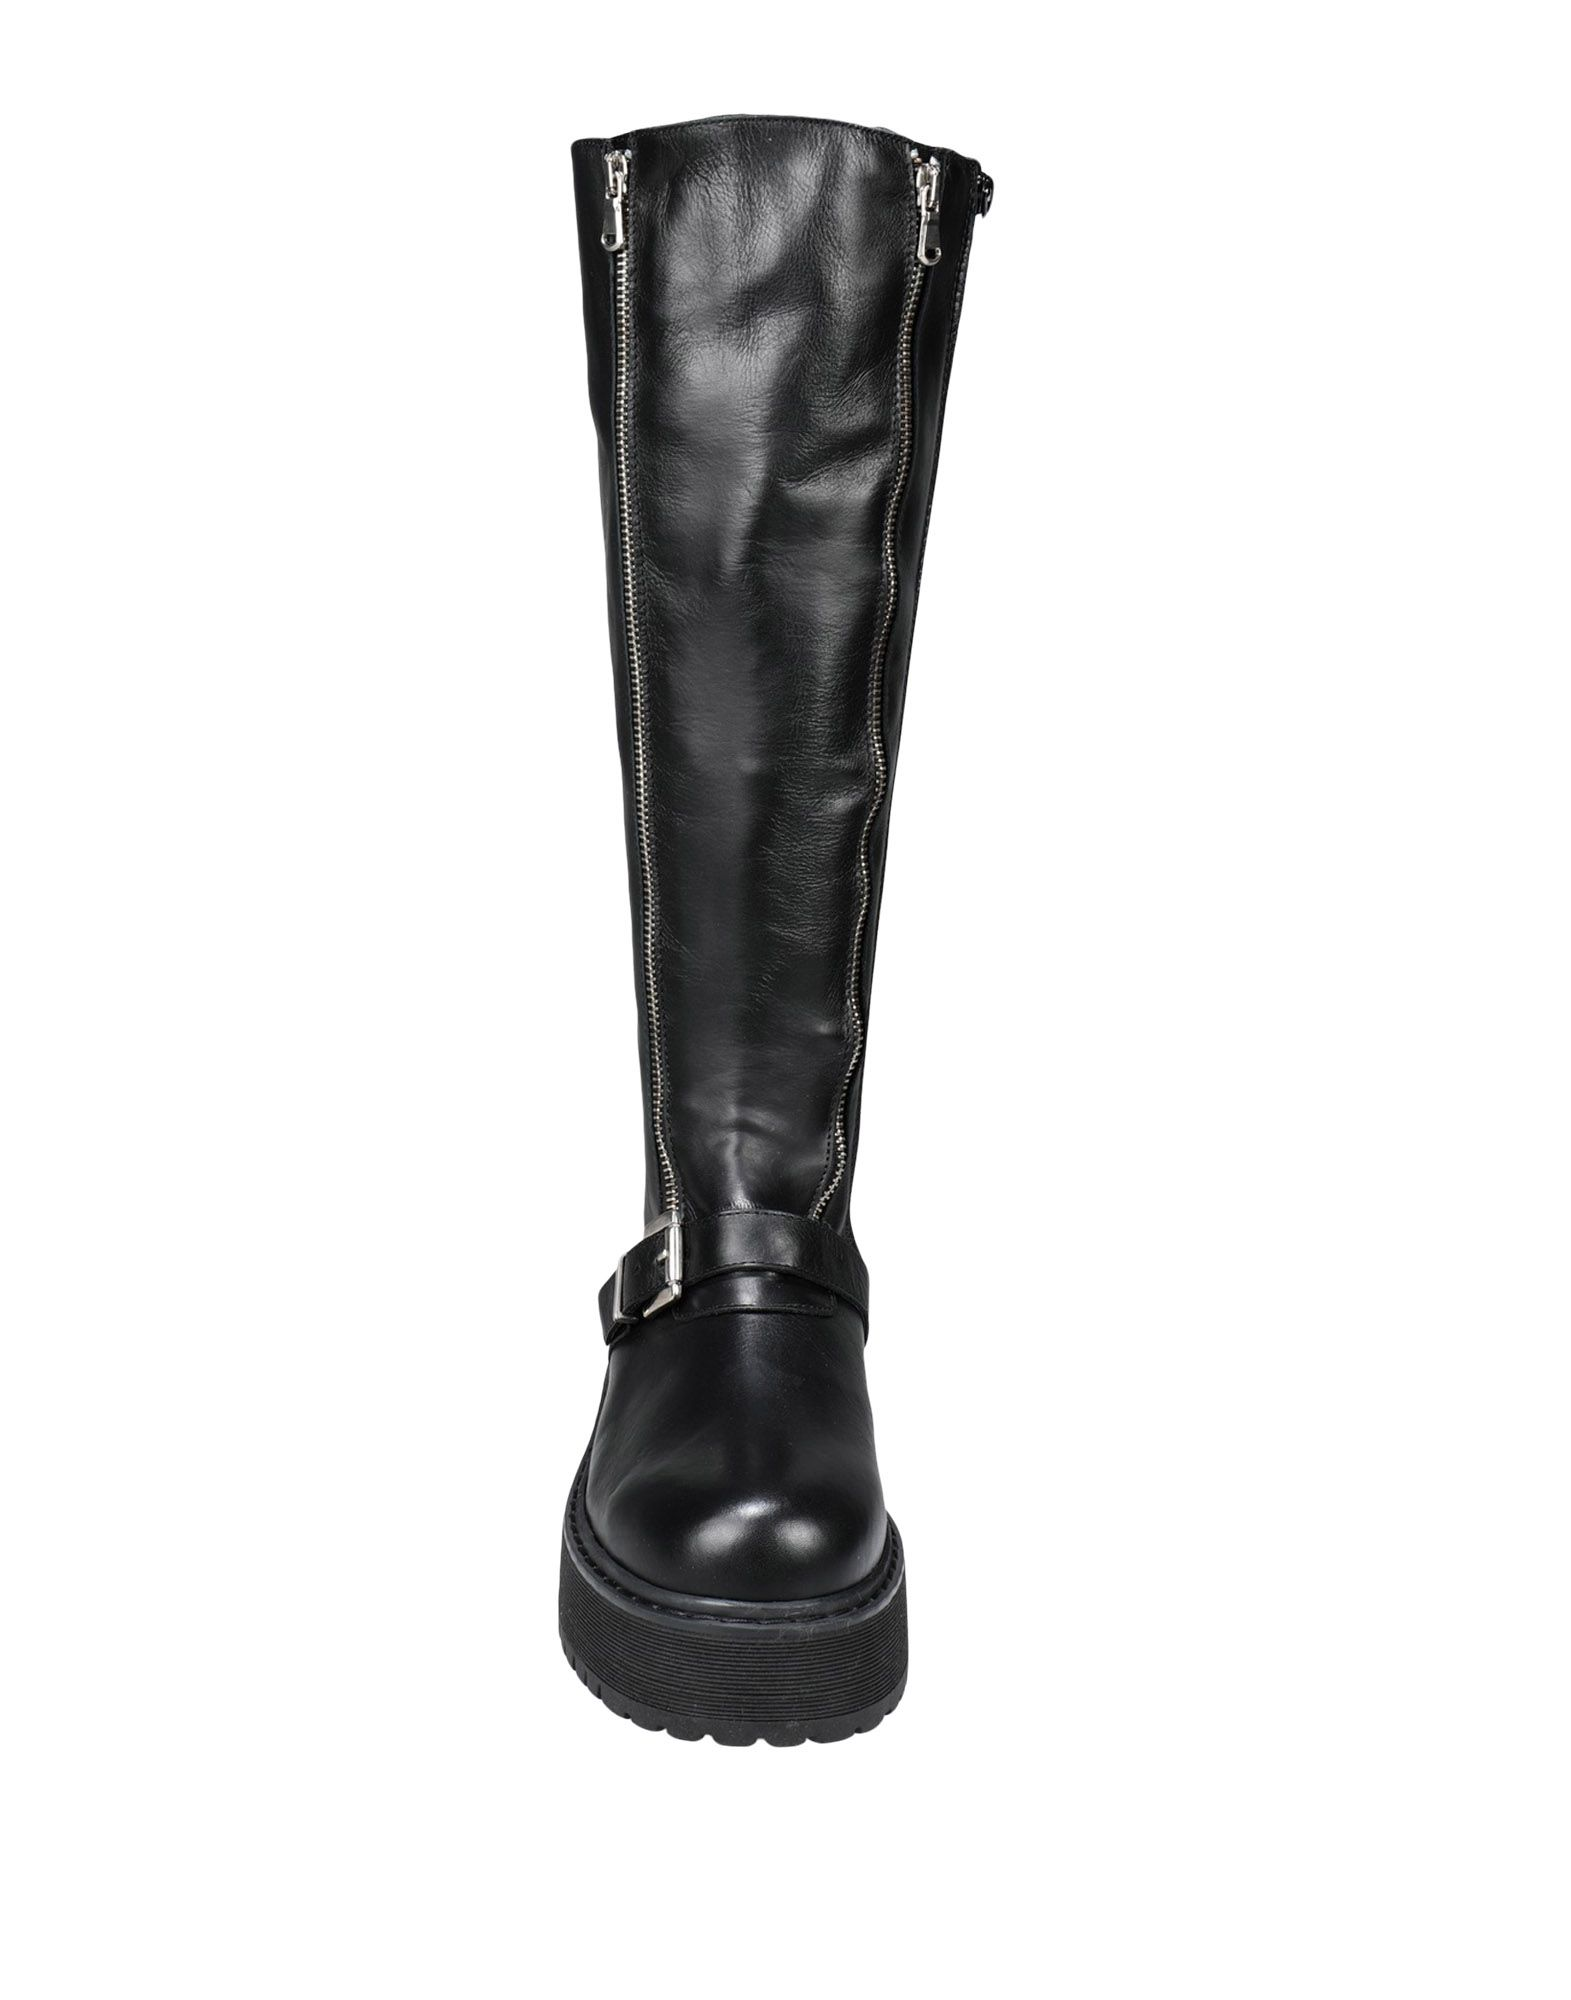 Stilvolle billige Schuhe Pierre Darré Stiefel Stiefel Darré Damen  11531152SF 154f38